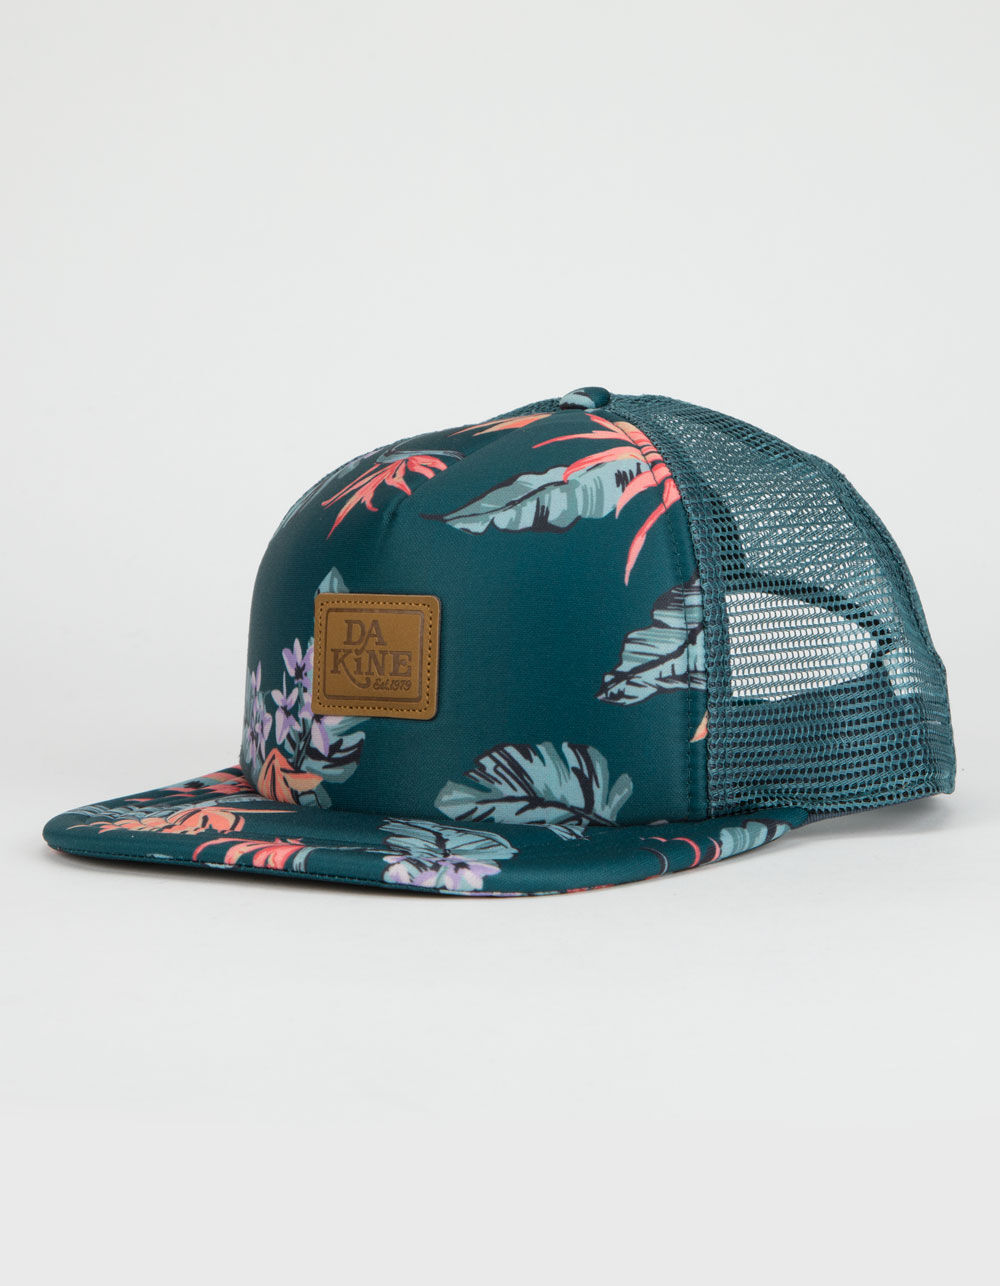 Image of DAKINE HULA TRUCKER HAT